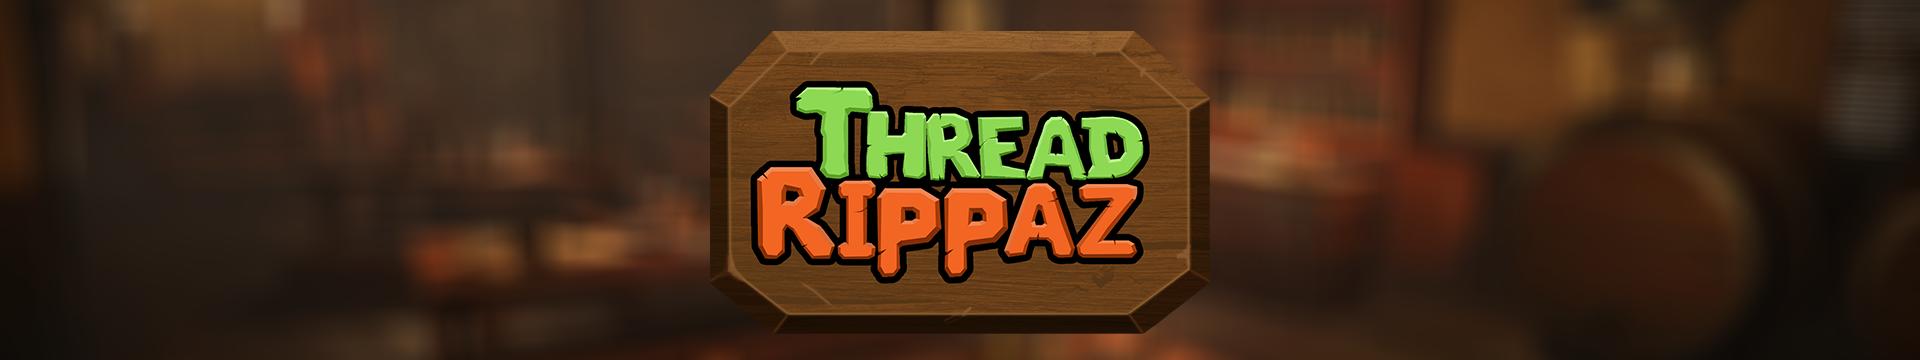 Thread Rippaz